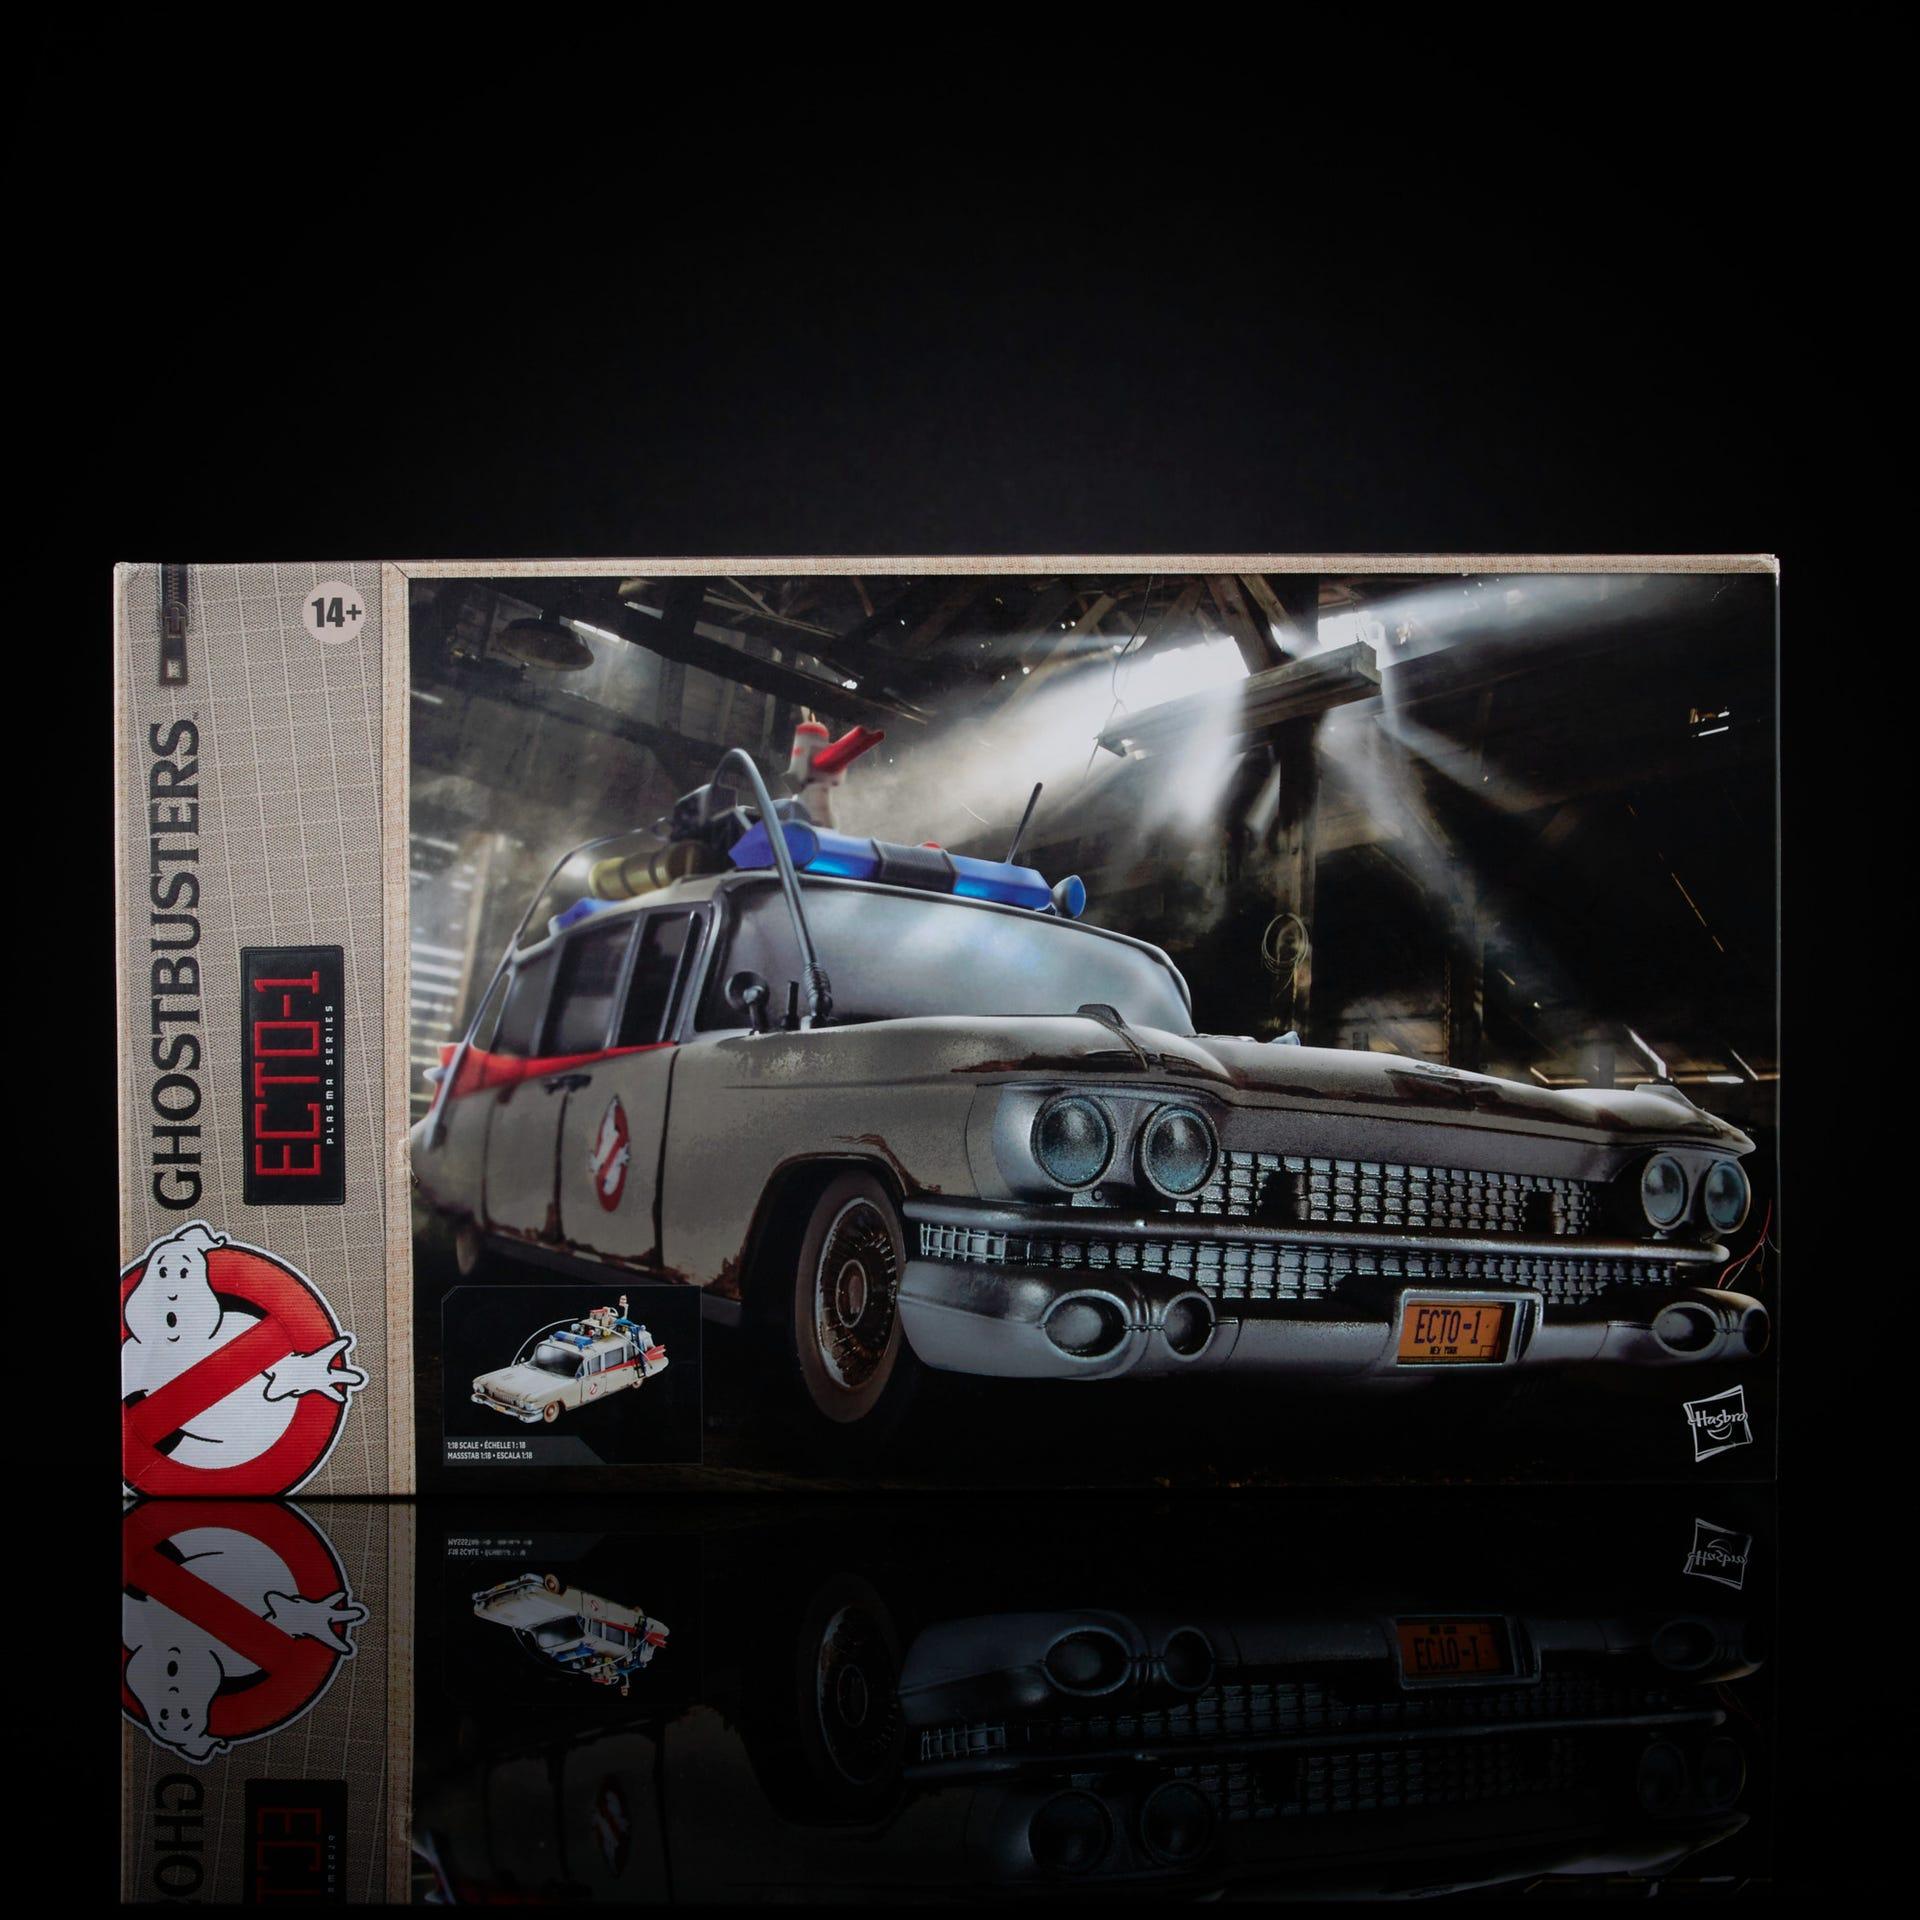 Ghostbusters Plasma Series Fahrzeug Ecto-1 E9557 5010993697922